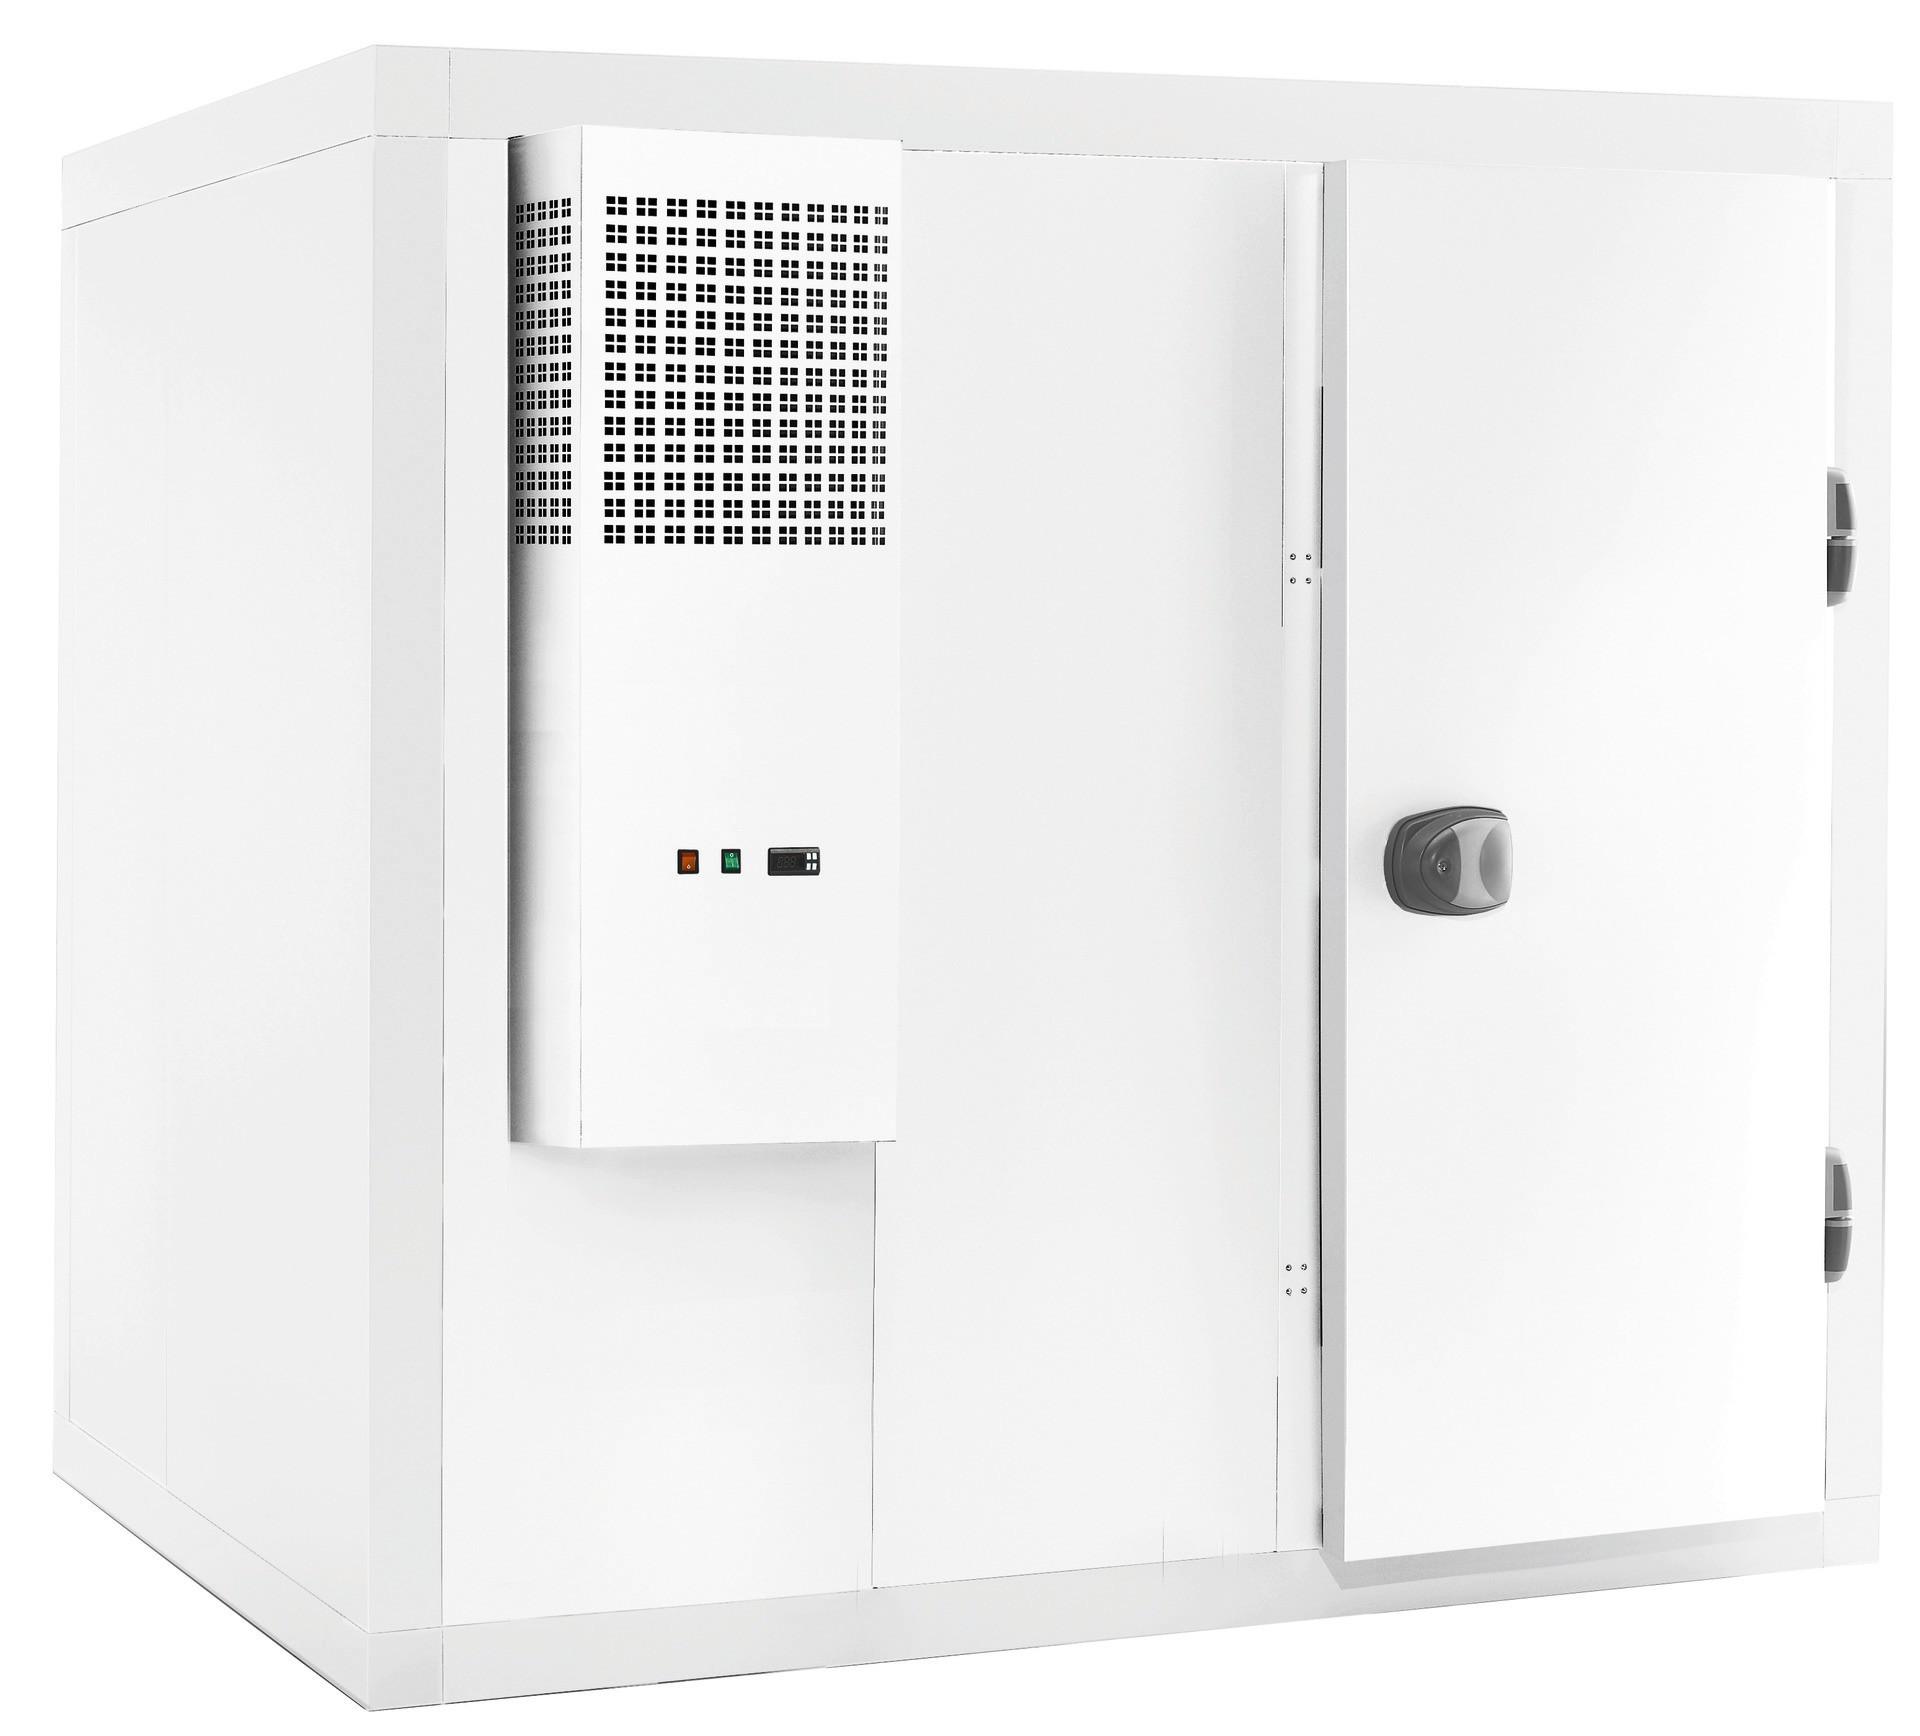 Tiefkühlaggregat für Kühlzelle 661047, 661048, 661051